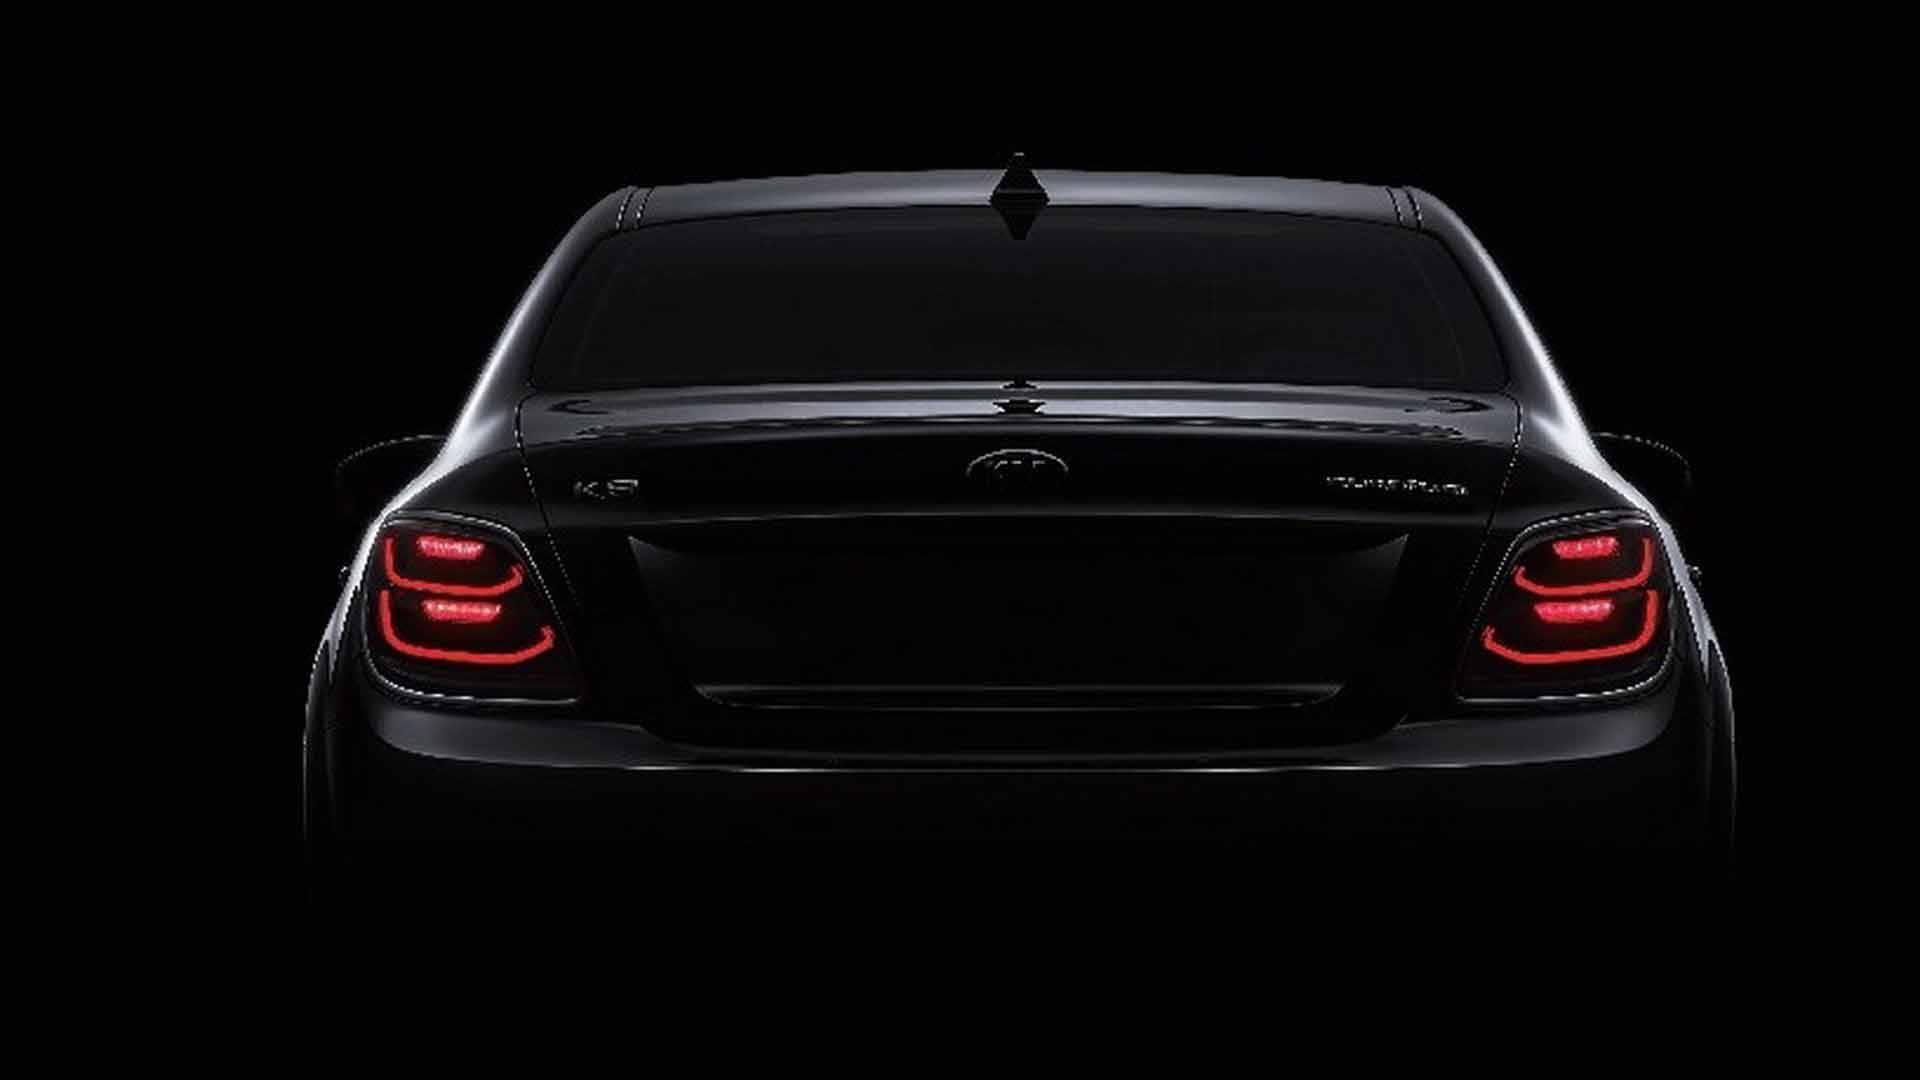 2019_2019KiaK900/K9FaceliftTeaserShowsNewHeadlights,AddedElegance-autoevolution